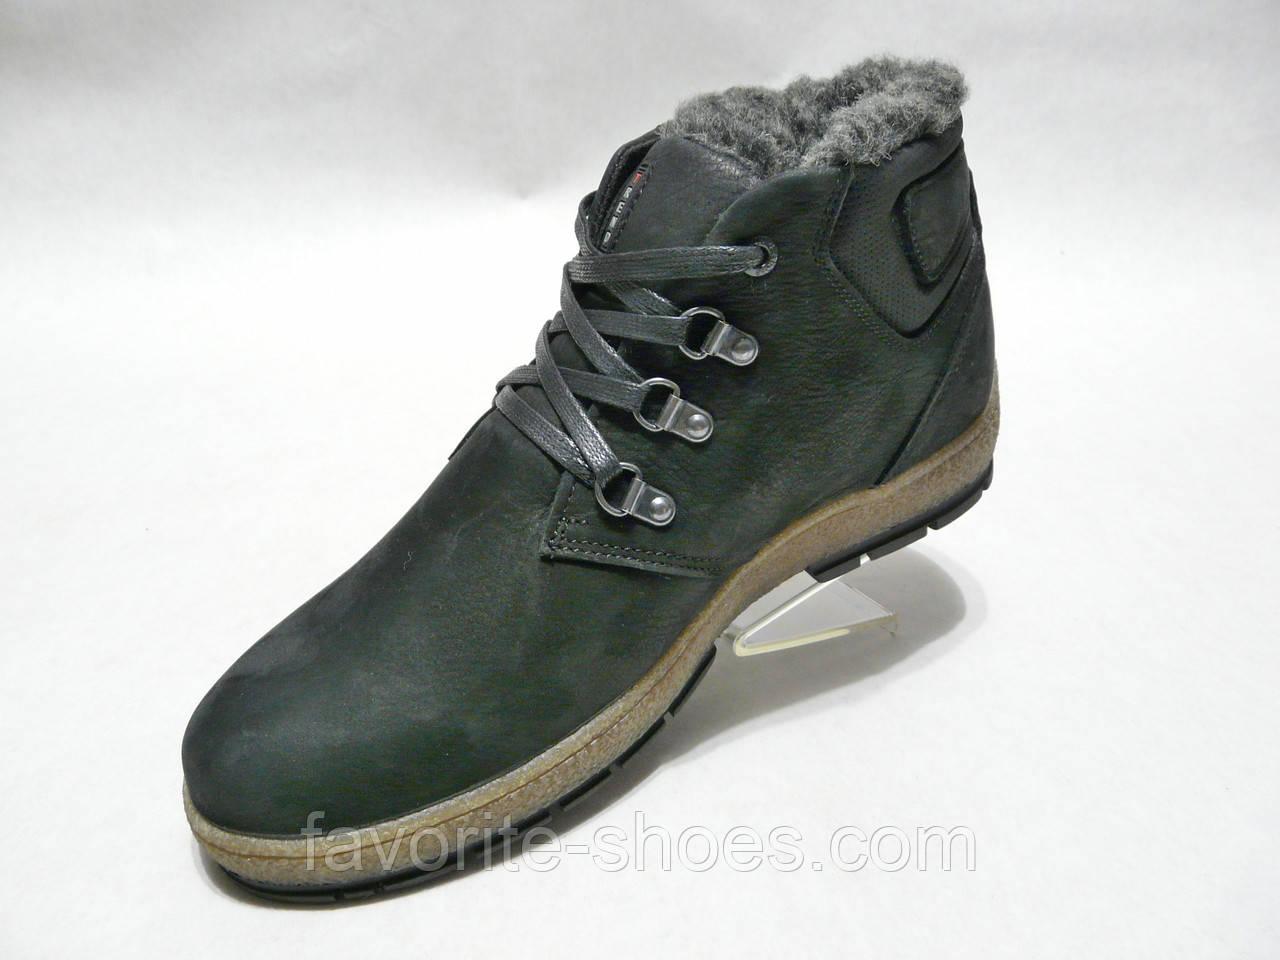 19dc1b5d4065 Зимние мужские кожаные ботинки columbia club shoes R1  продажа, цена ...